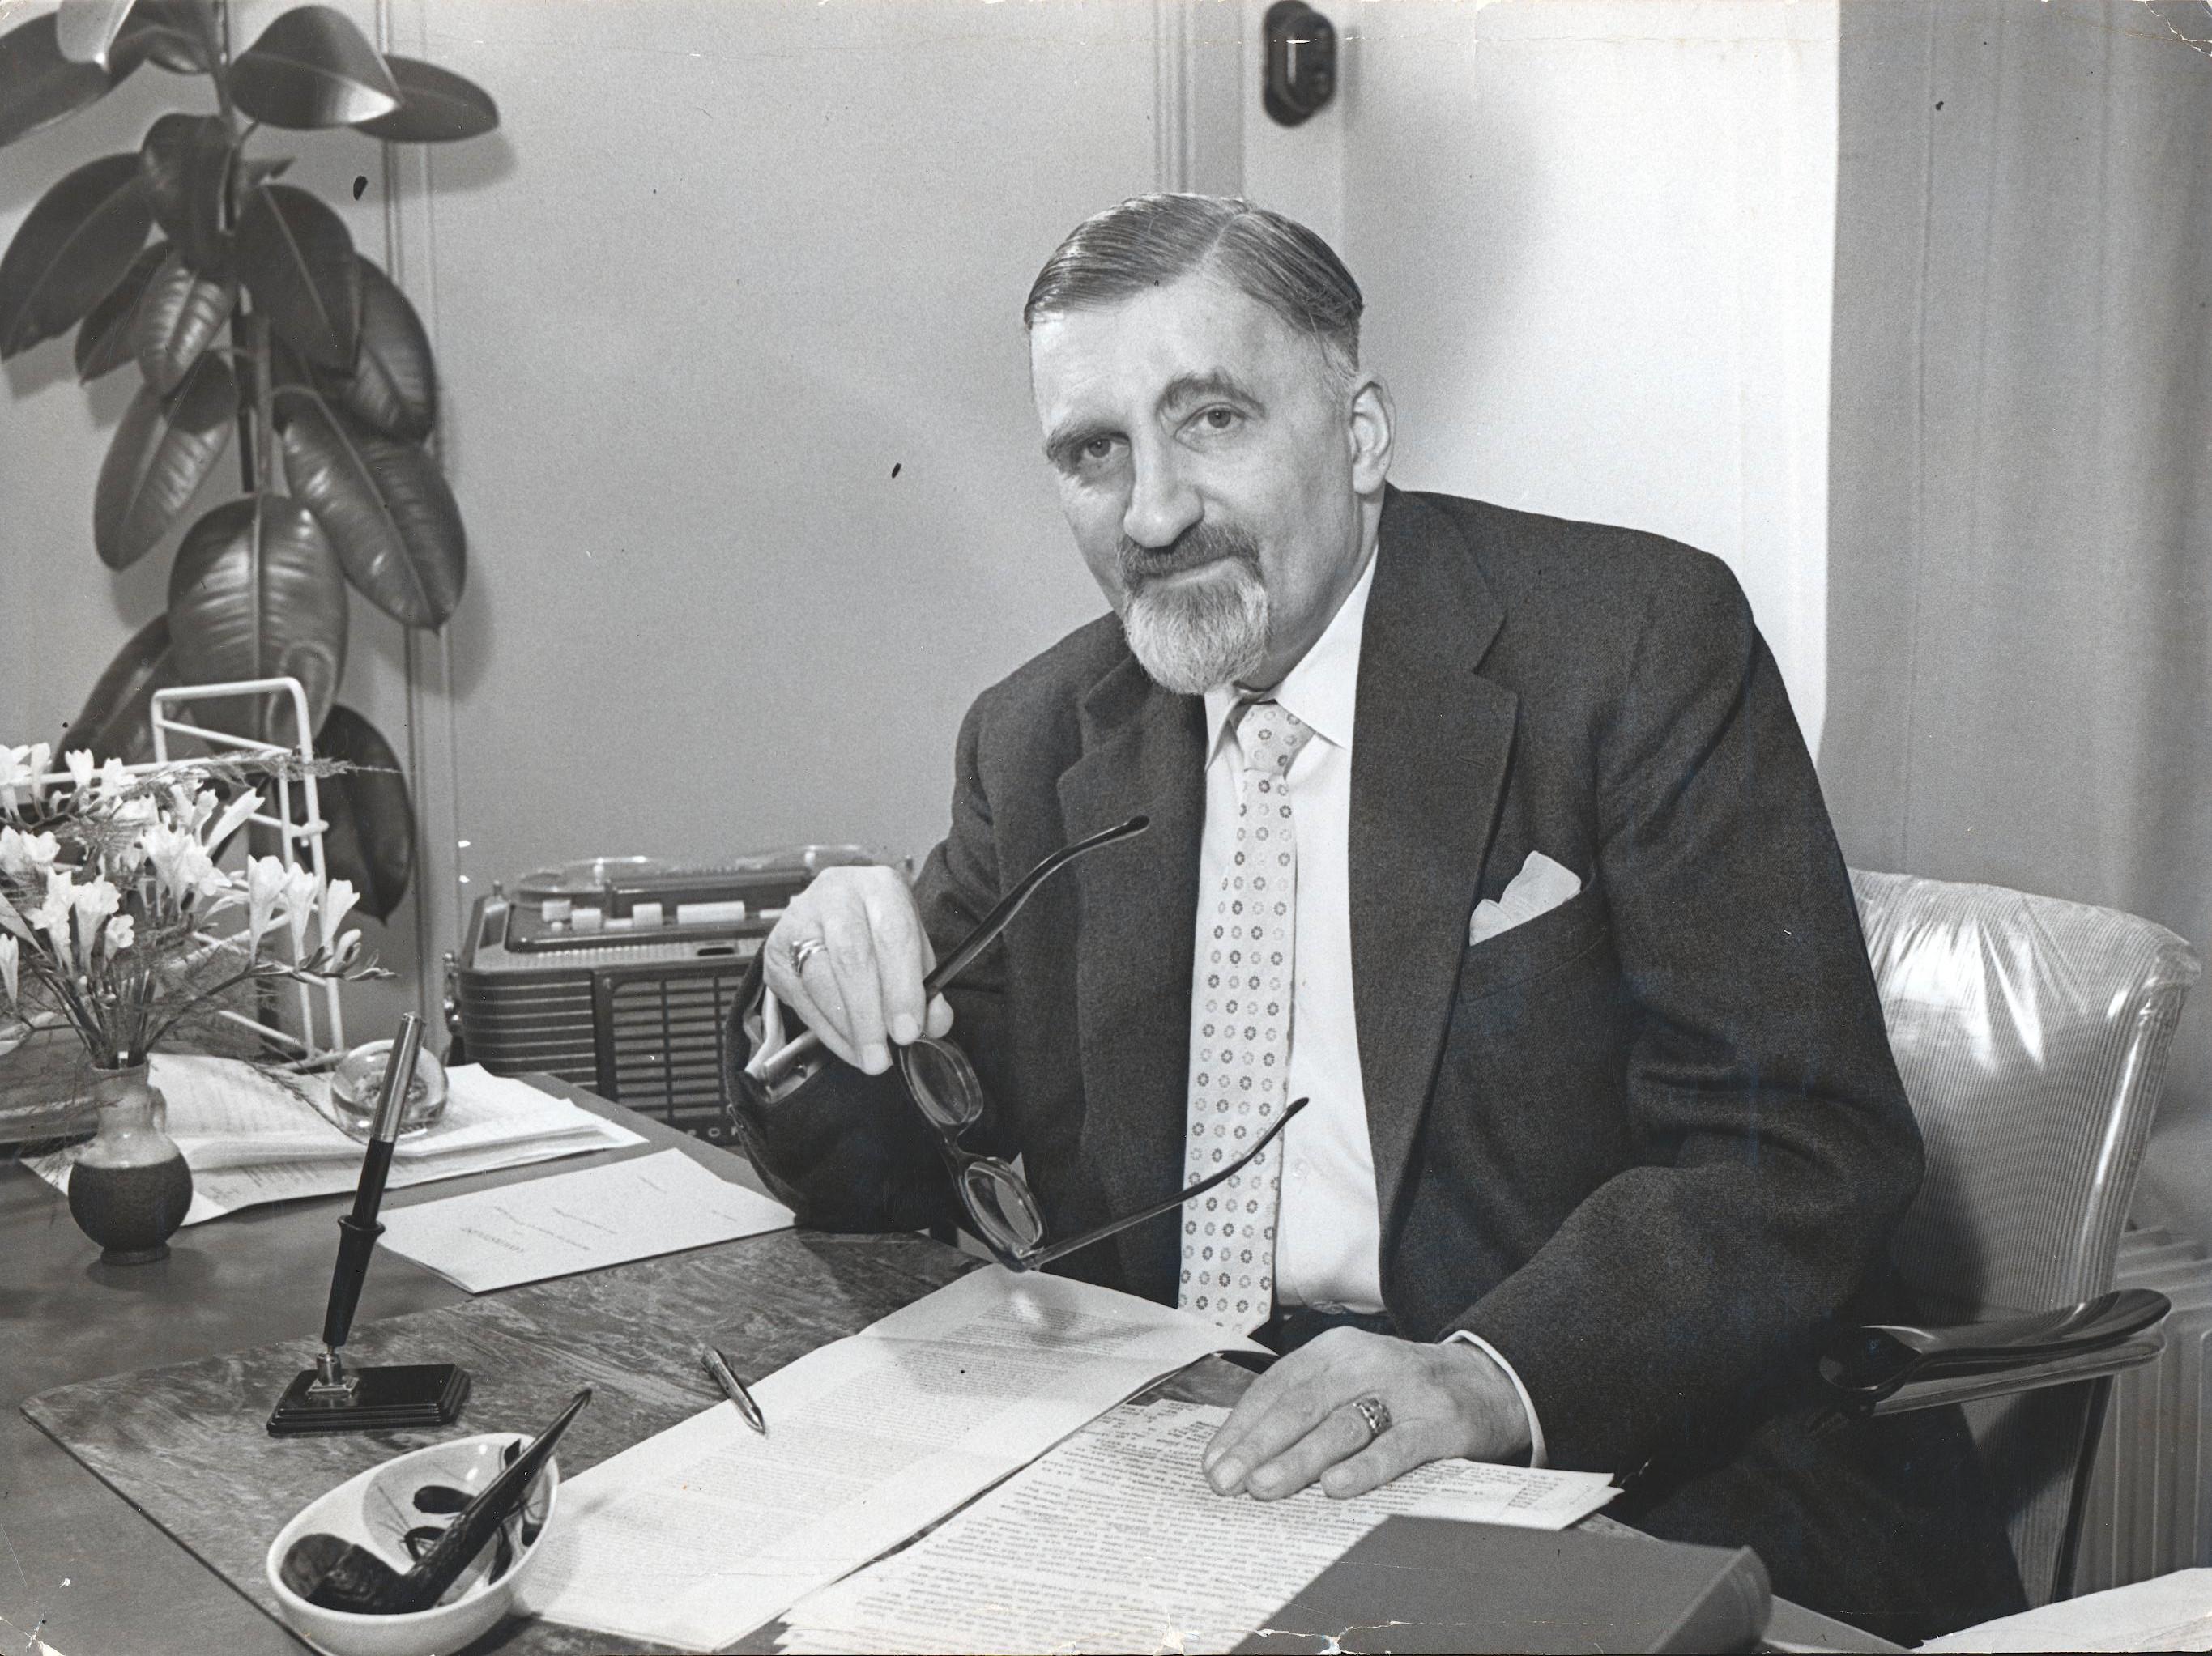 Pof. Dr. Wilhelm Heinrich Carl Tenhaeff  (1894-1981)